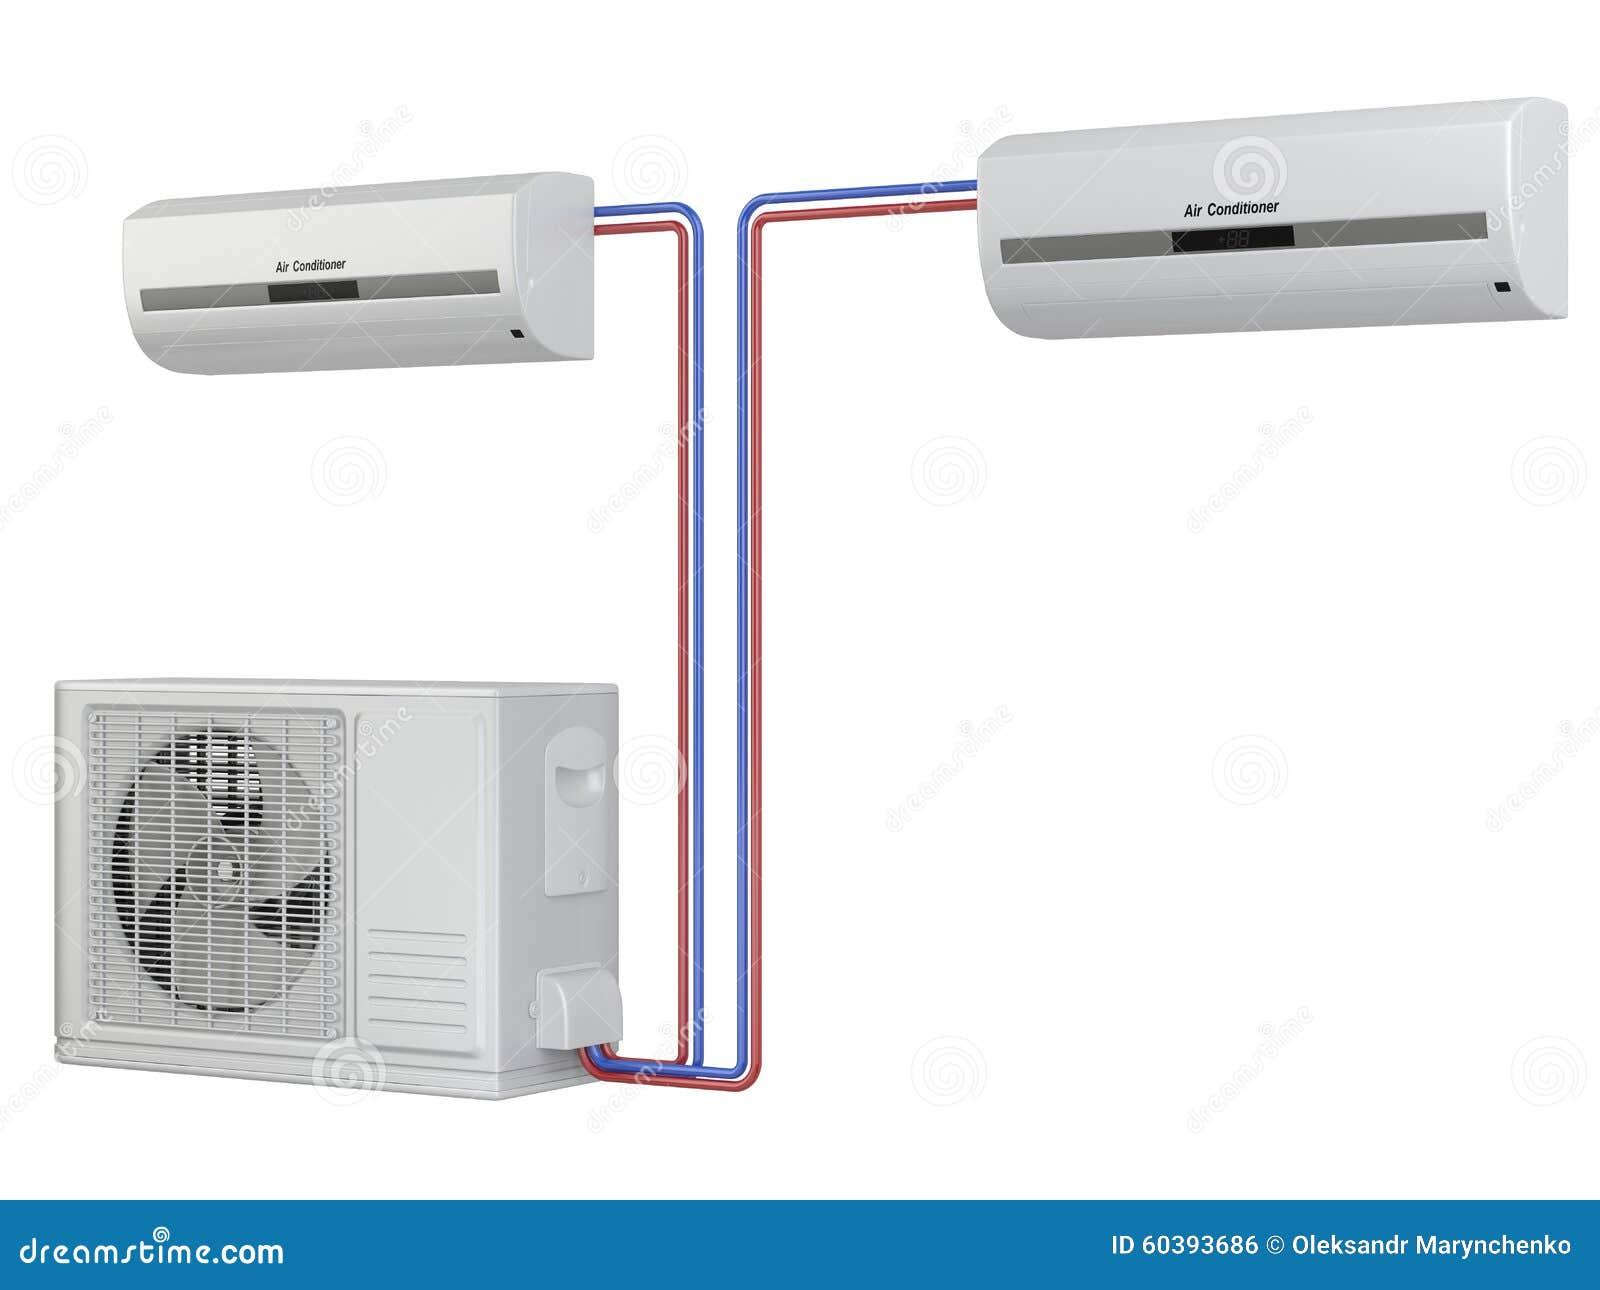 modern air conditioner system installation of equipment. Black Bedroom Furniture Sets. Home Design Ideas